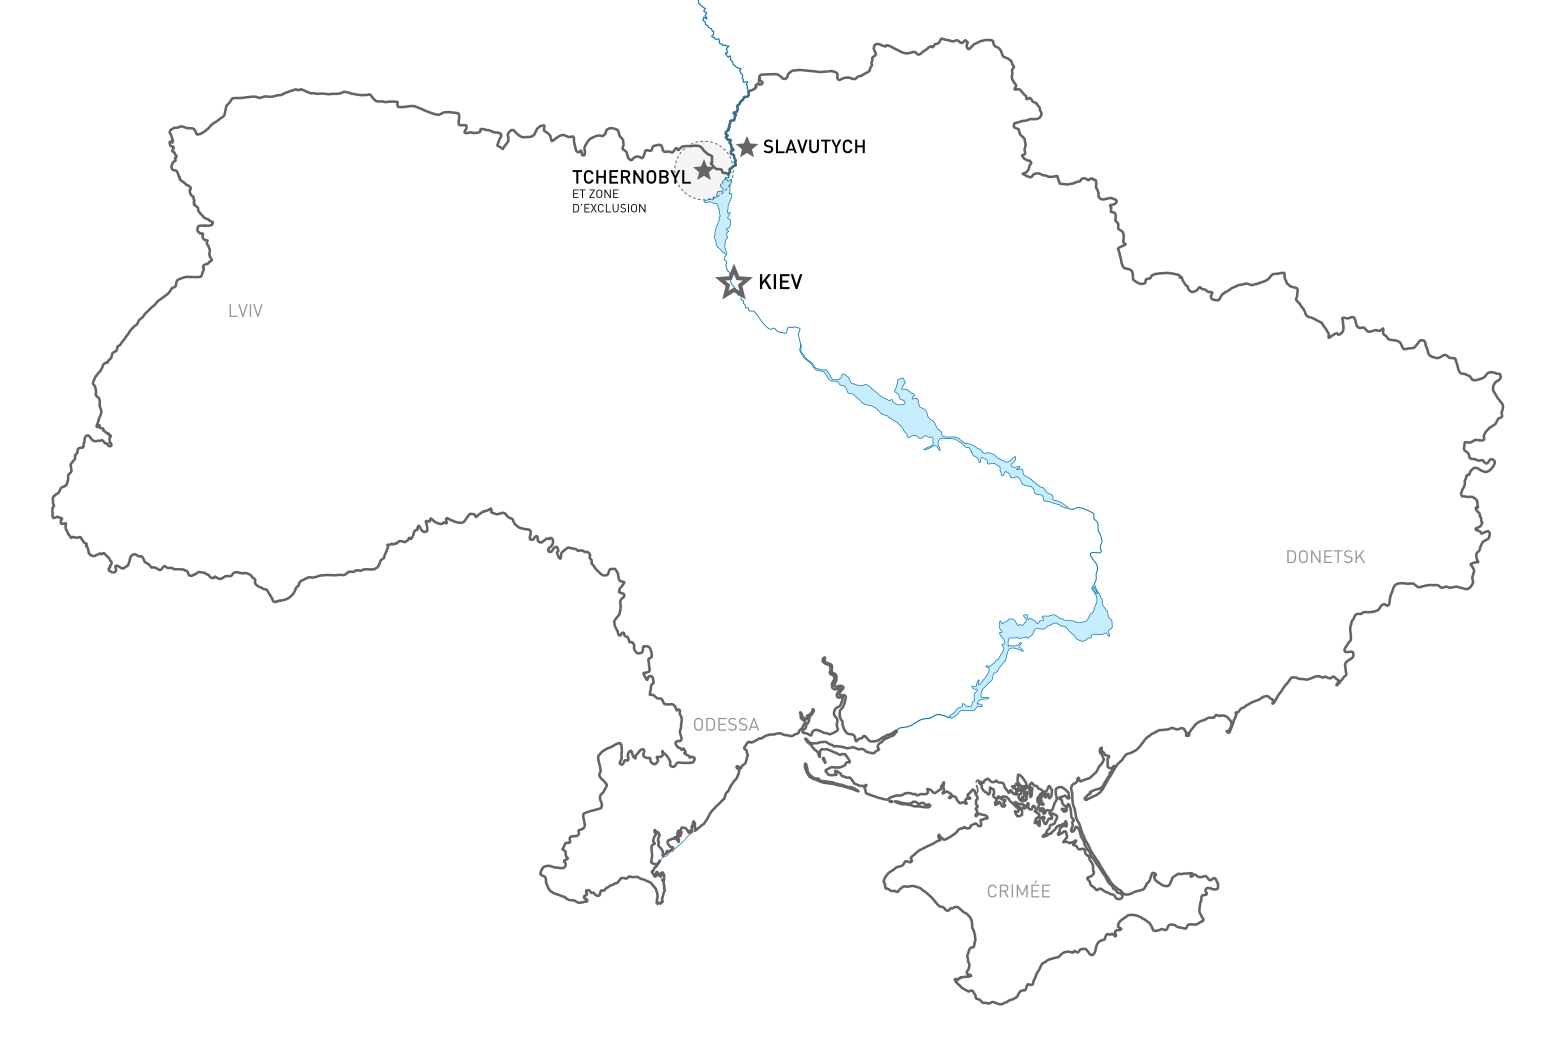 Ukraine_location_map.png